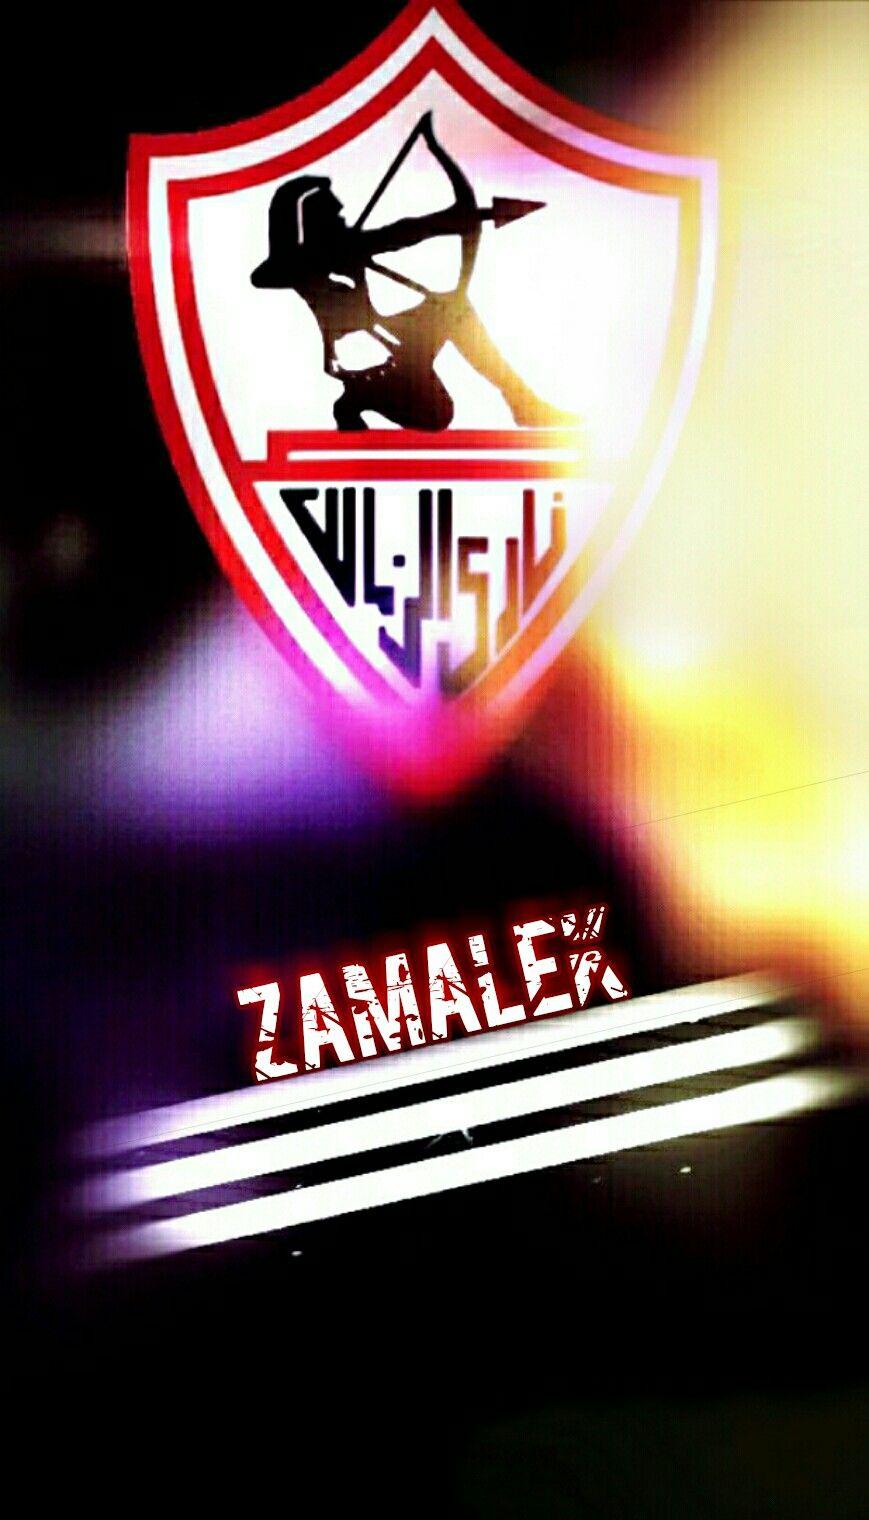 Egypt Zamalekphoto Zamalek Photo Pic Zamaleksc Zamalek Zamaleksc Sporting Club 1911 Photo Fans Lover Wallpaper 3d Hd A Zamalek Sc Photo Sports